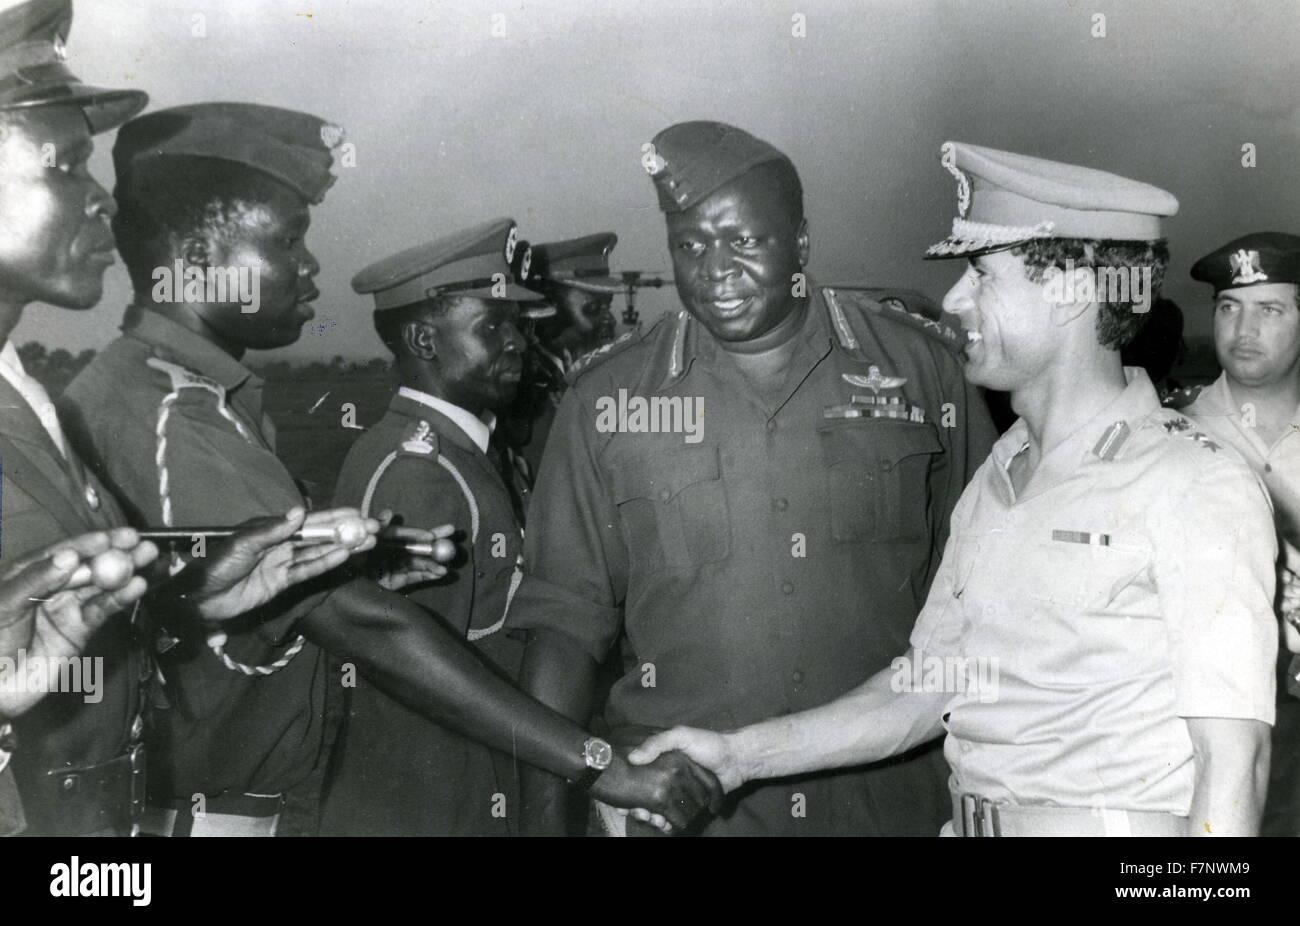 Idi Amin Dada (ch. 1925 - 16 août 2003) Centre avec Mouammar Kadhafi c.?1942 - 2011, la Jamahiriya révolutionnaire Photo Stock